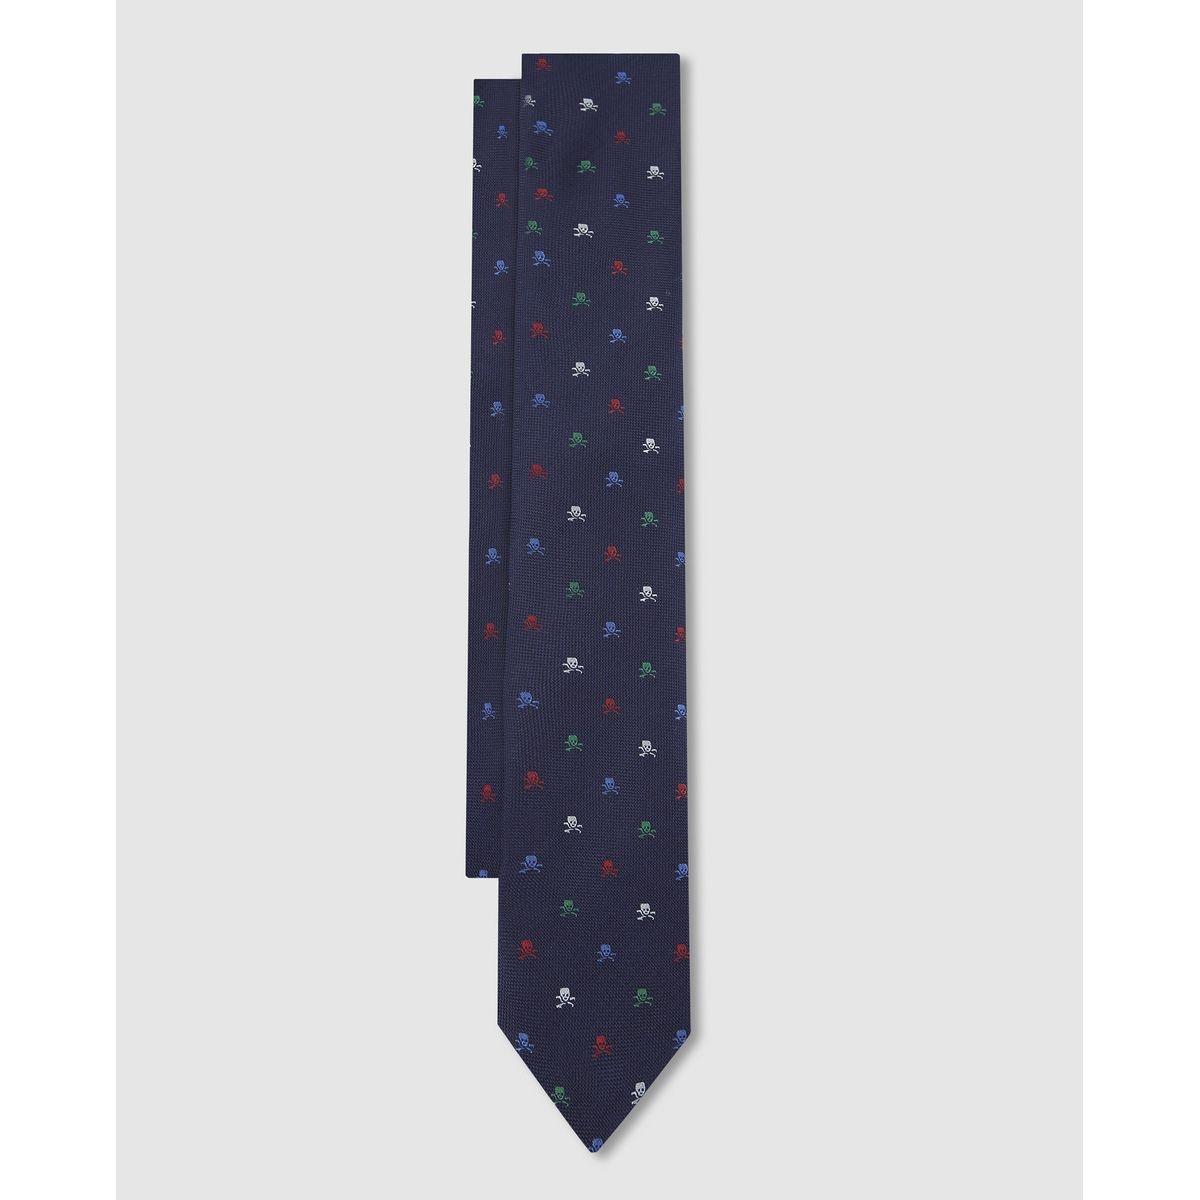 Cravate en soie bleu marine micro têtes de mort